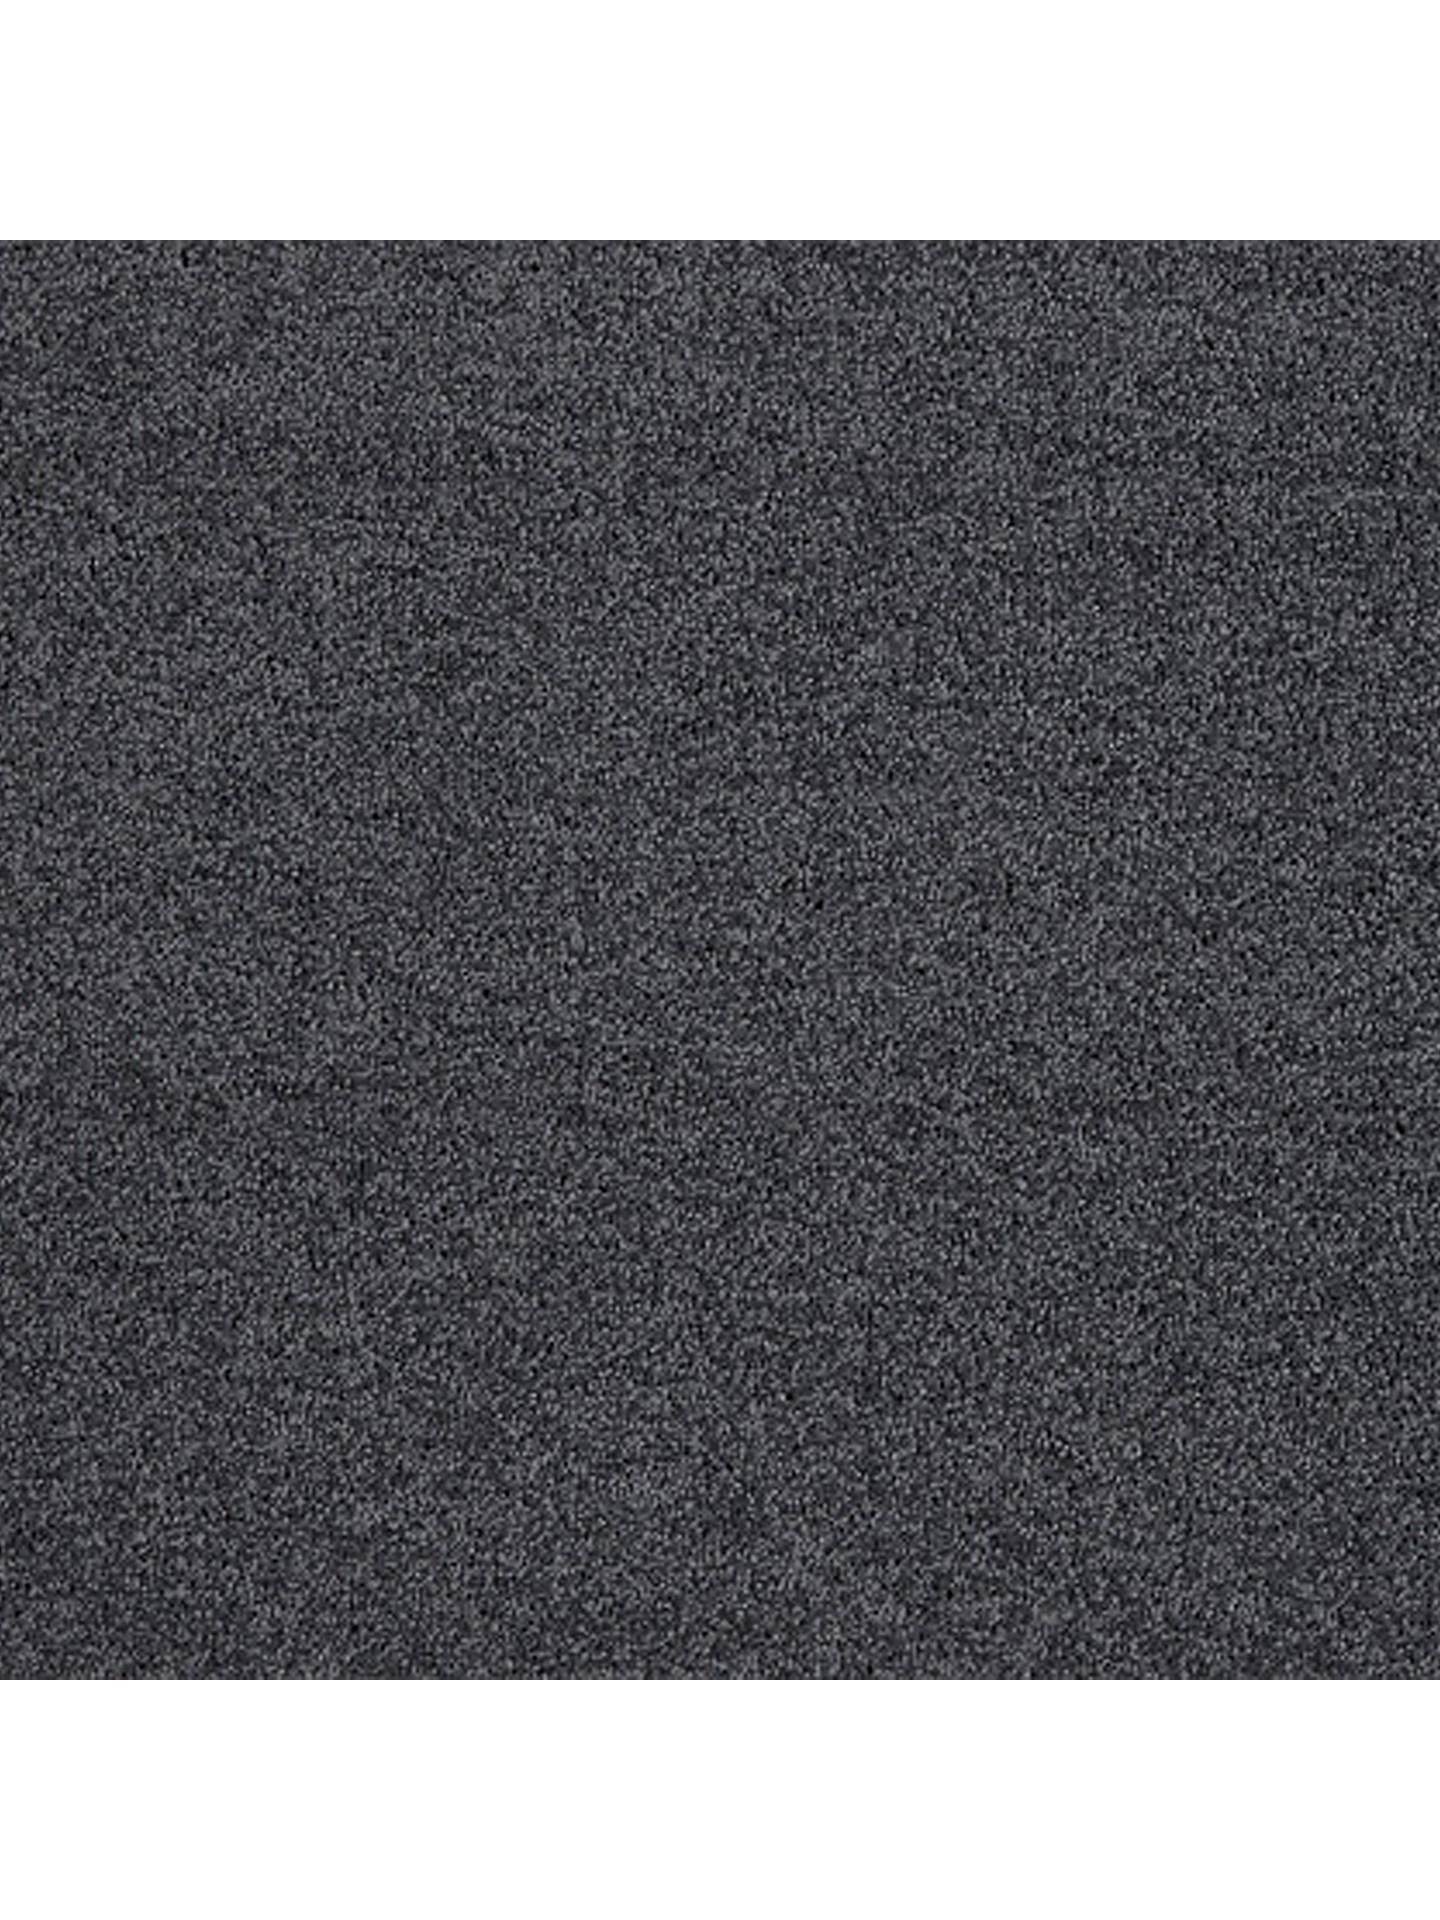 Mohawk Comfort Twist Carpet at John